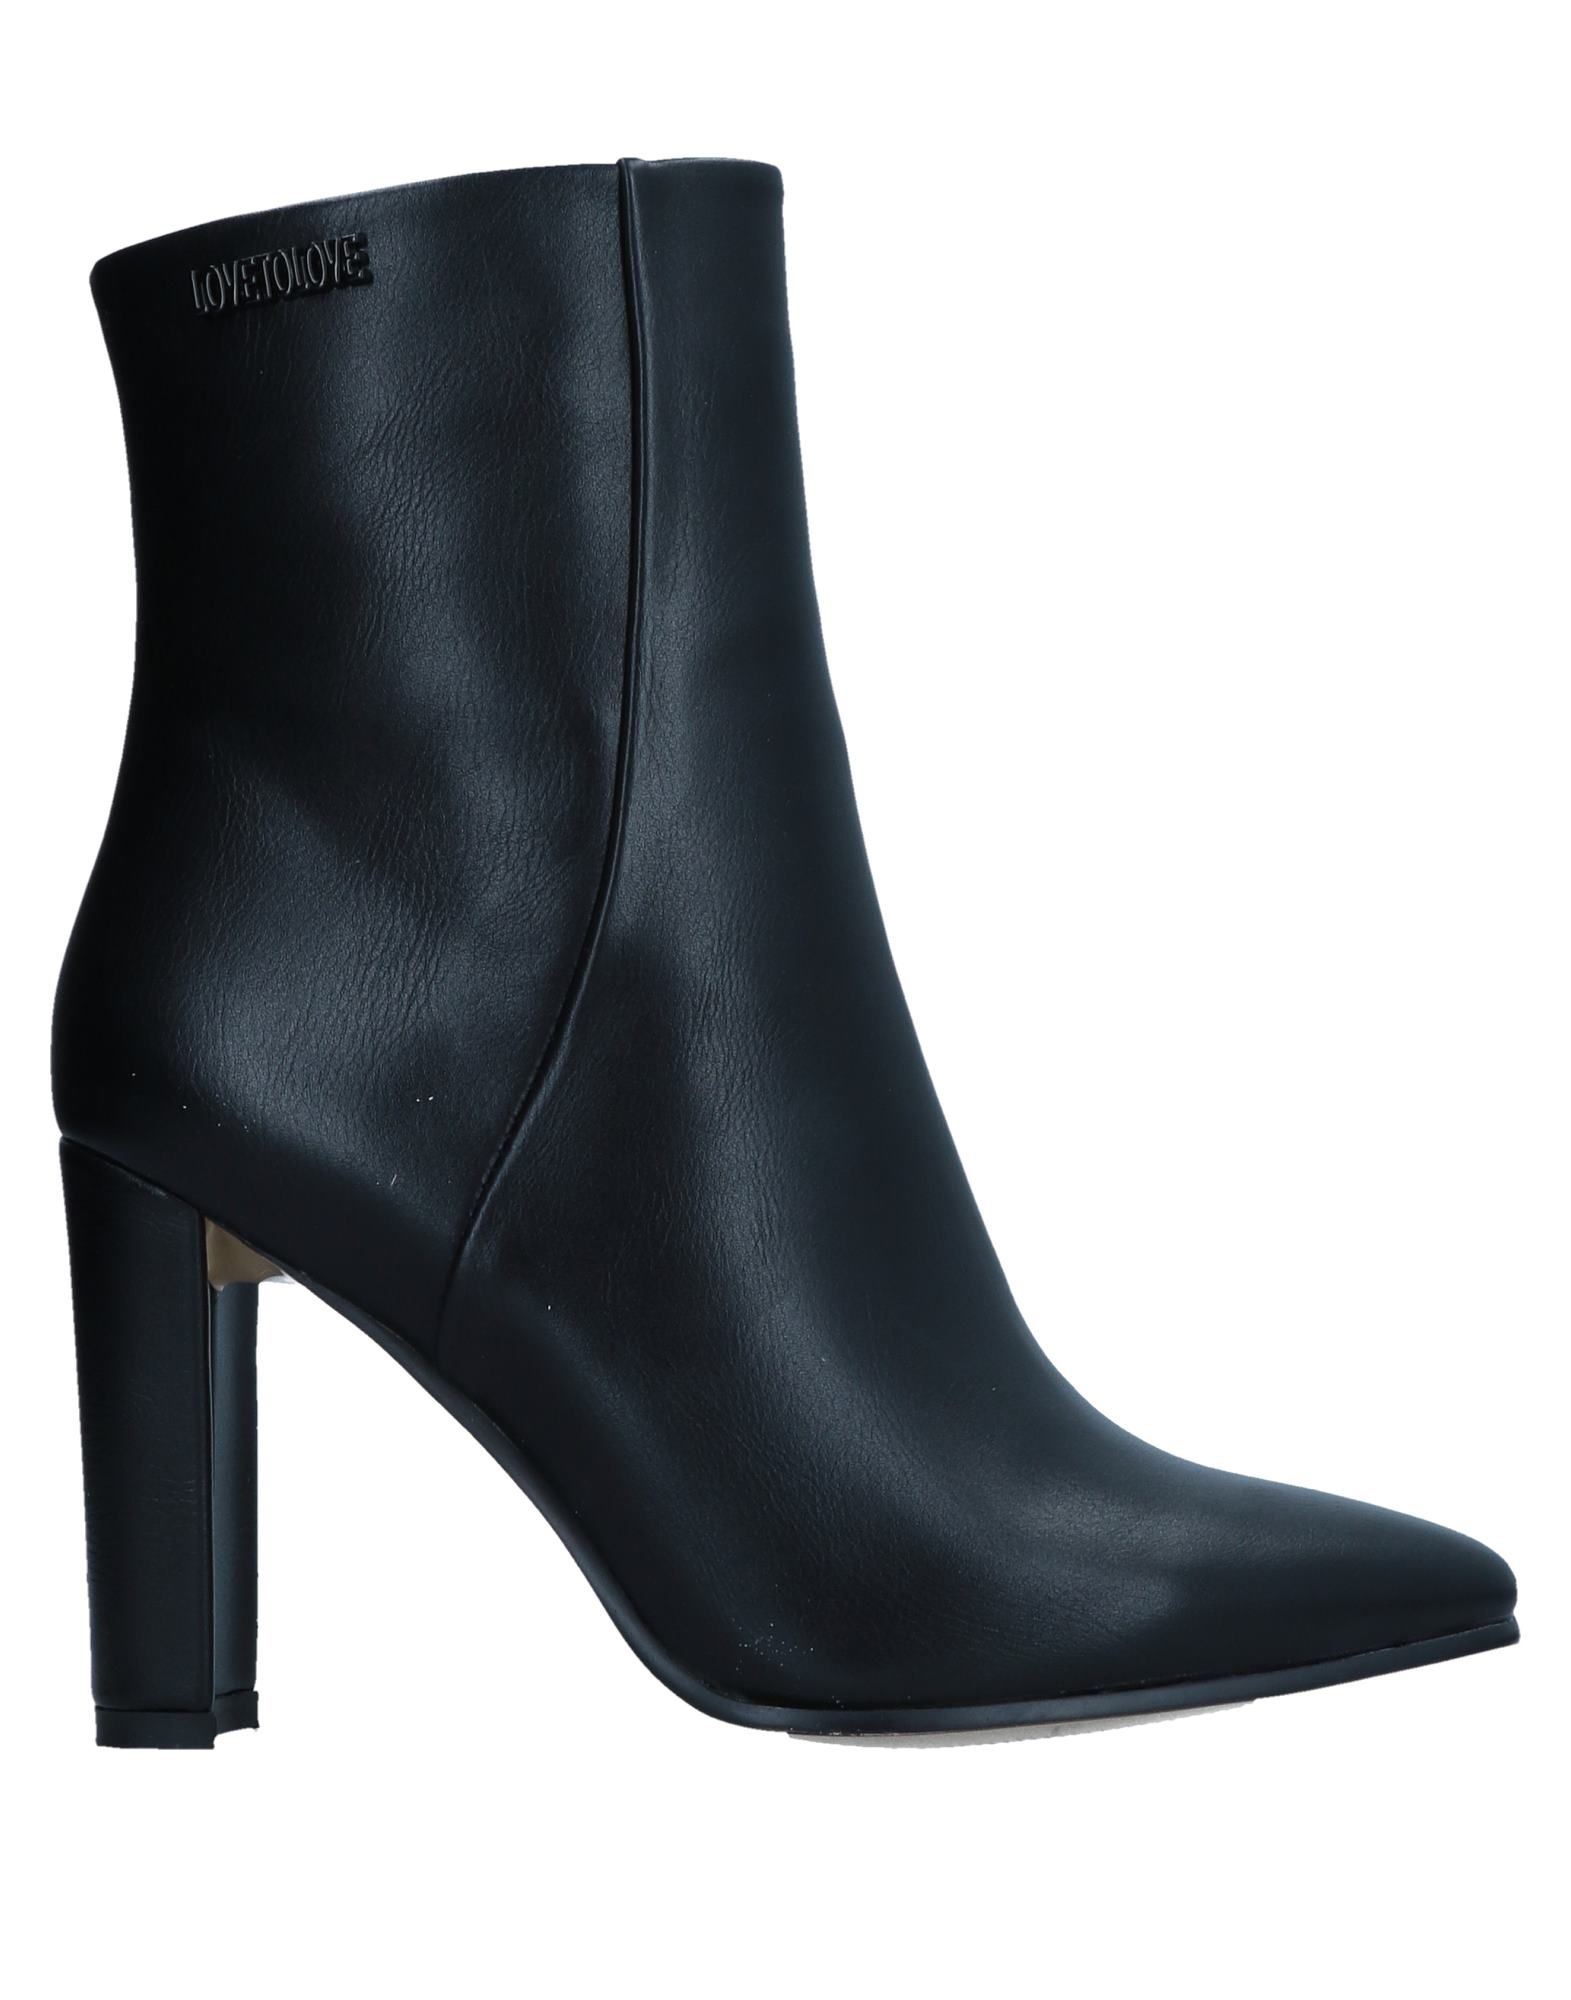 Gai 11546613NS Mattiolo Stiefelette Damen  11546613NS Gai Gute Qualität beliebte Schuhe defa62